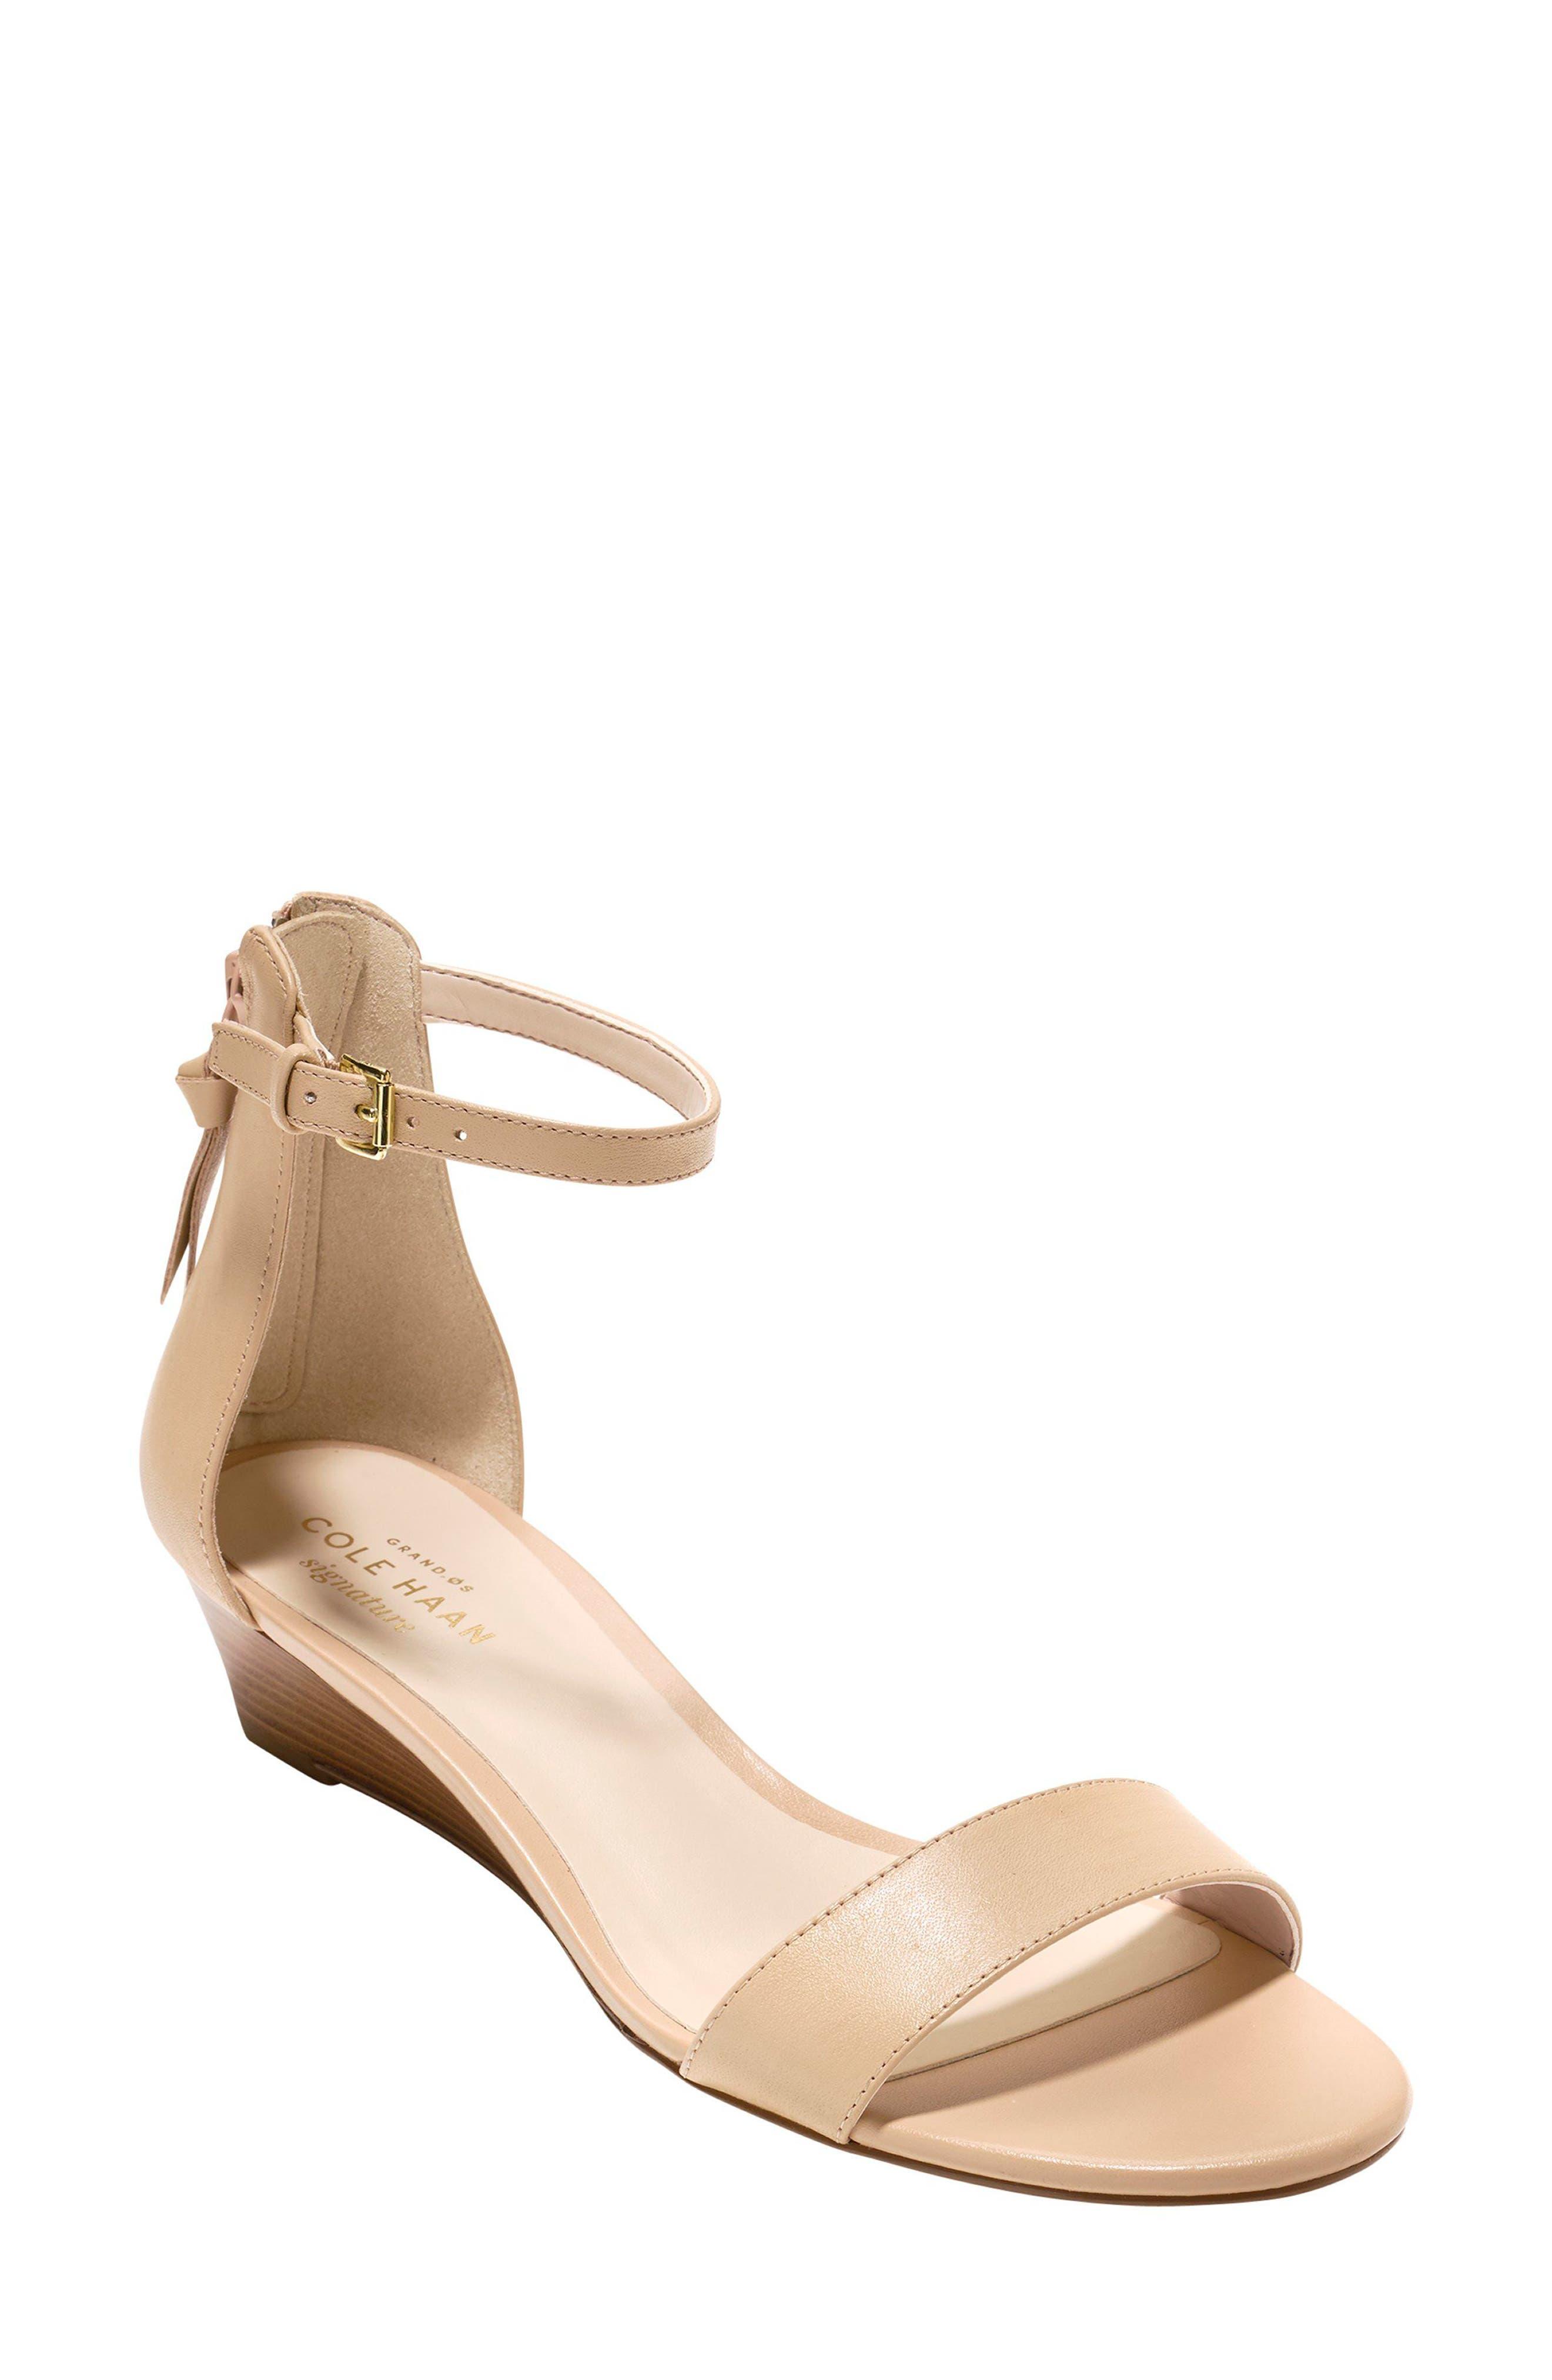 Cole Haan Adderly Sandal